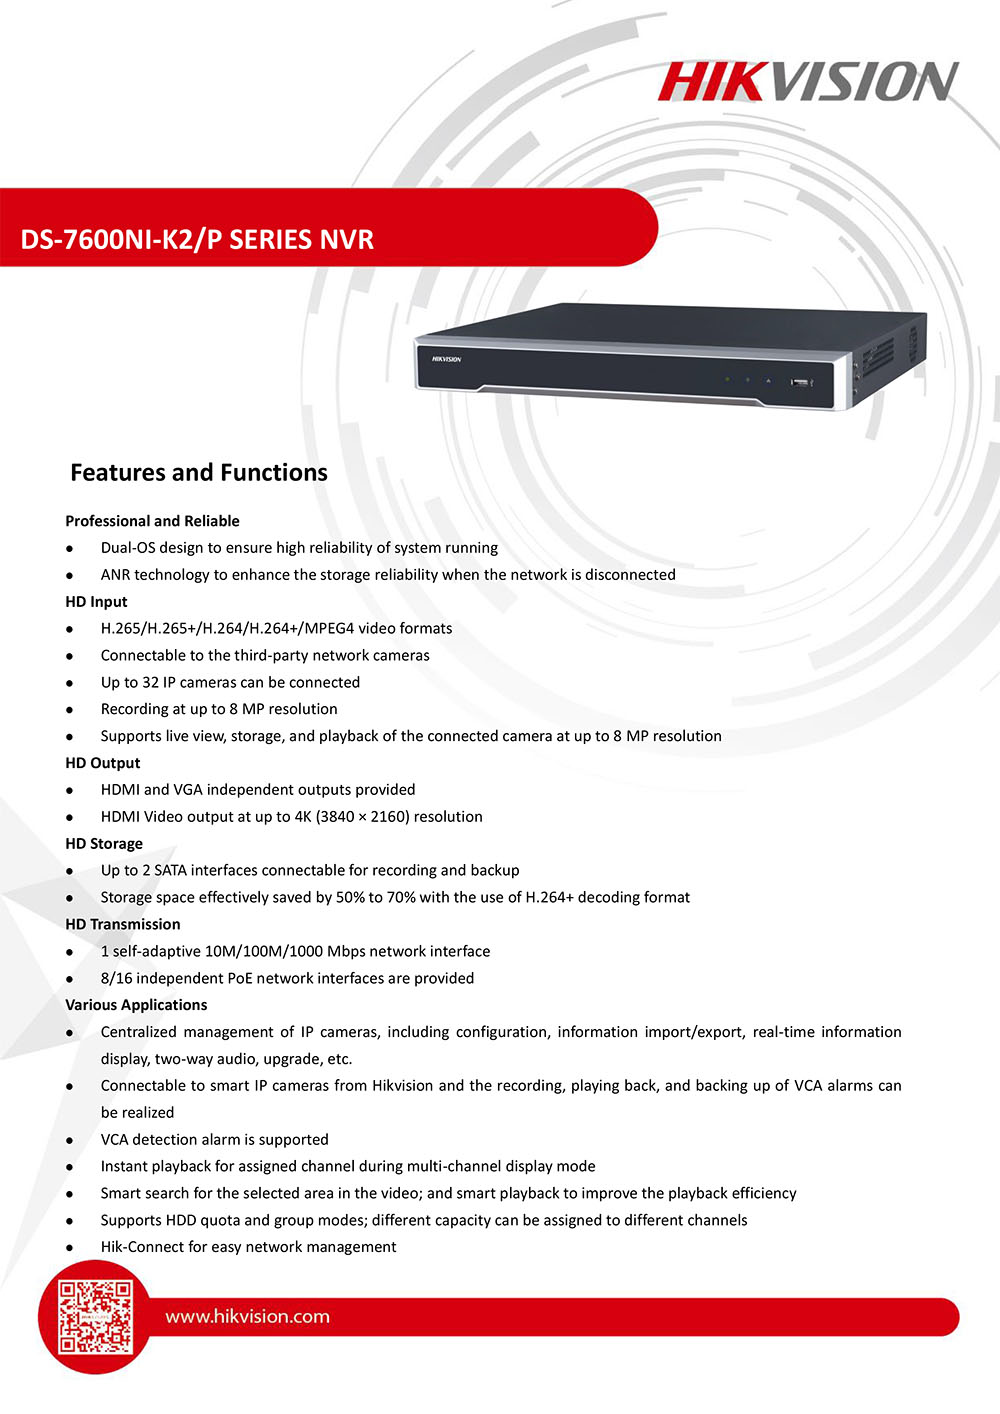 UD00212B_Datasheet_of_DS-7600NI-K2_P_NVR_V3.4.92_20170314-1